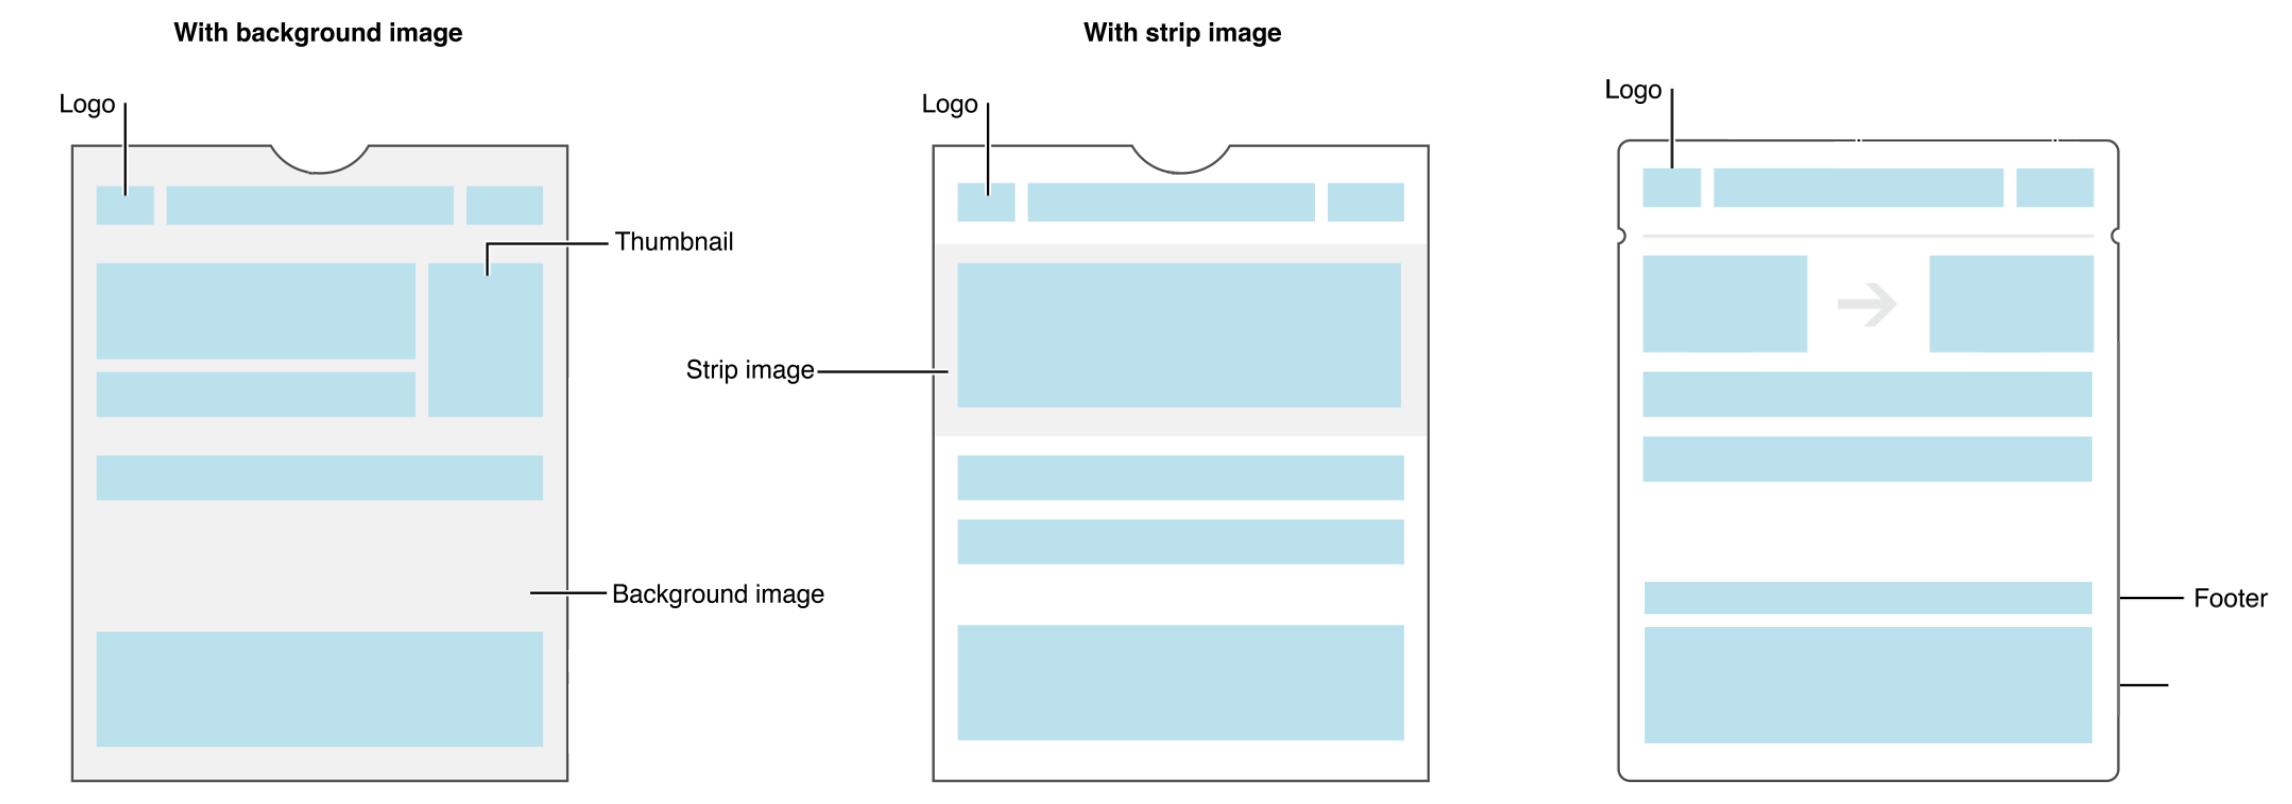 header_images_layout